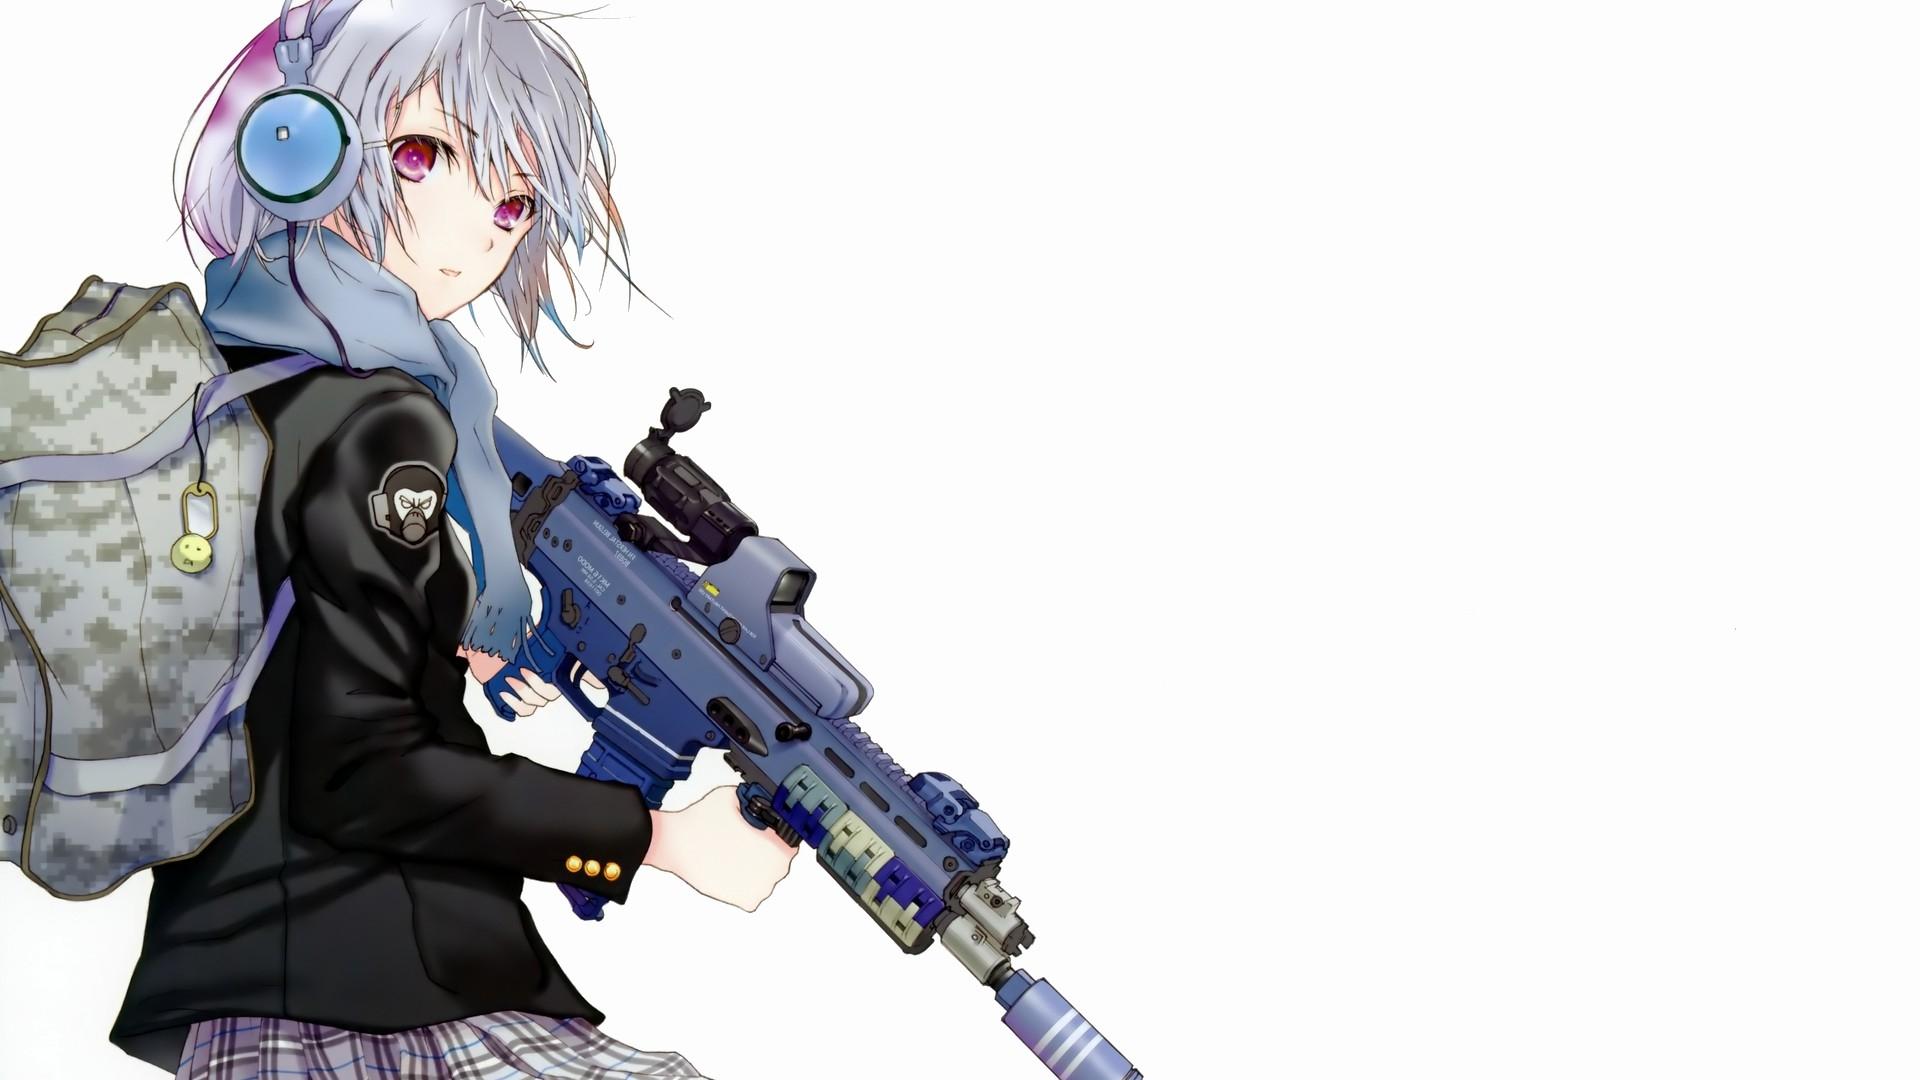 Wallpaper : Anime, Girl, Attitude, Backpack, Weapons